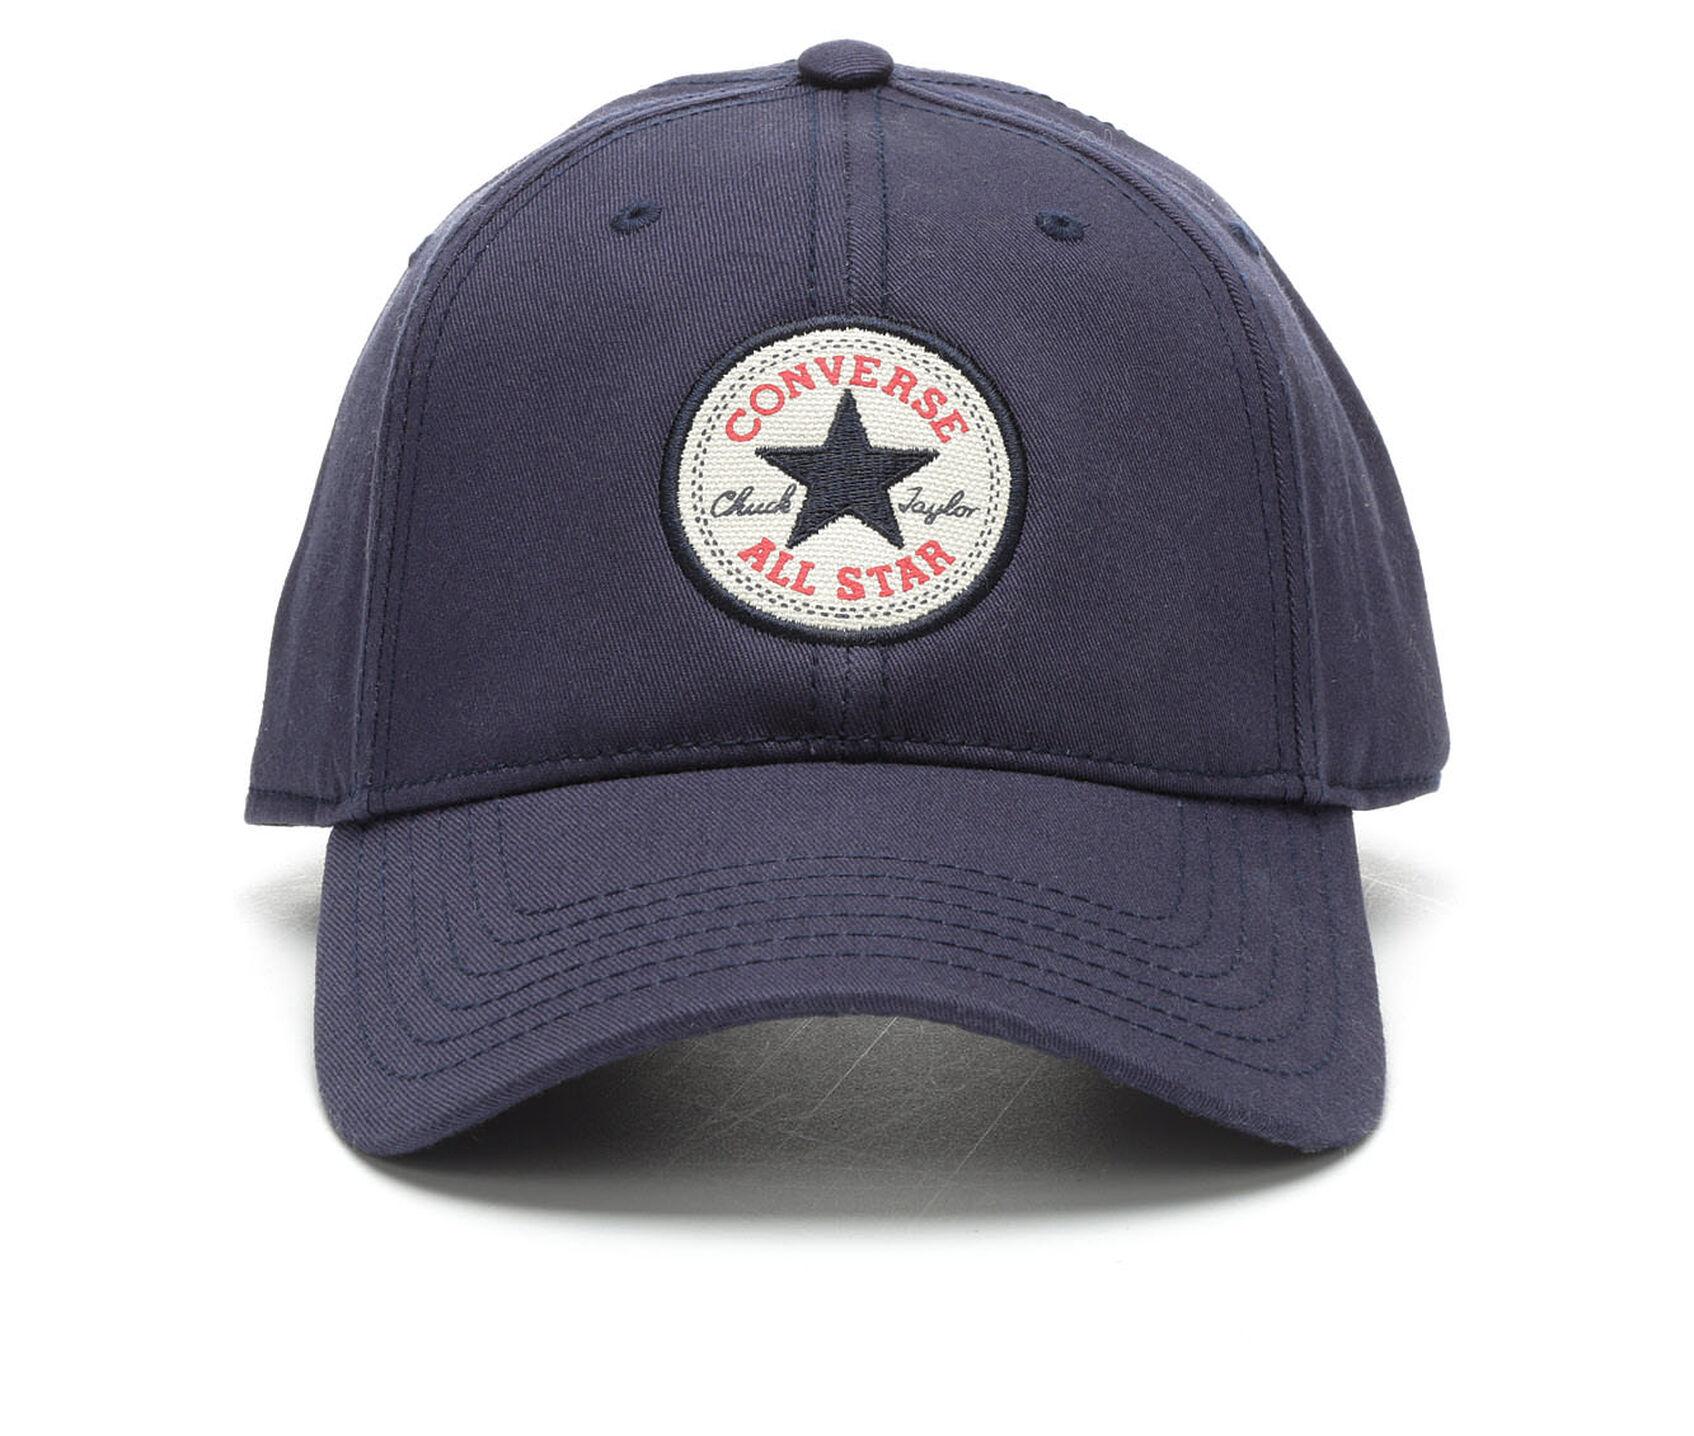 bab0ddad0c568 Converse Core Classic Twill Baseball Cap